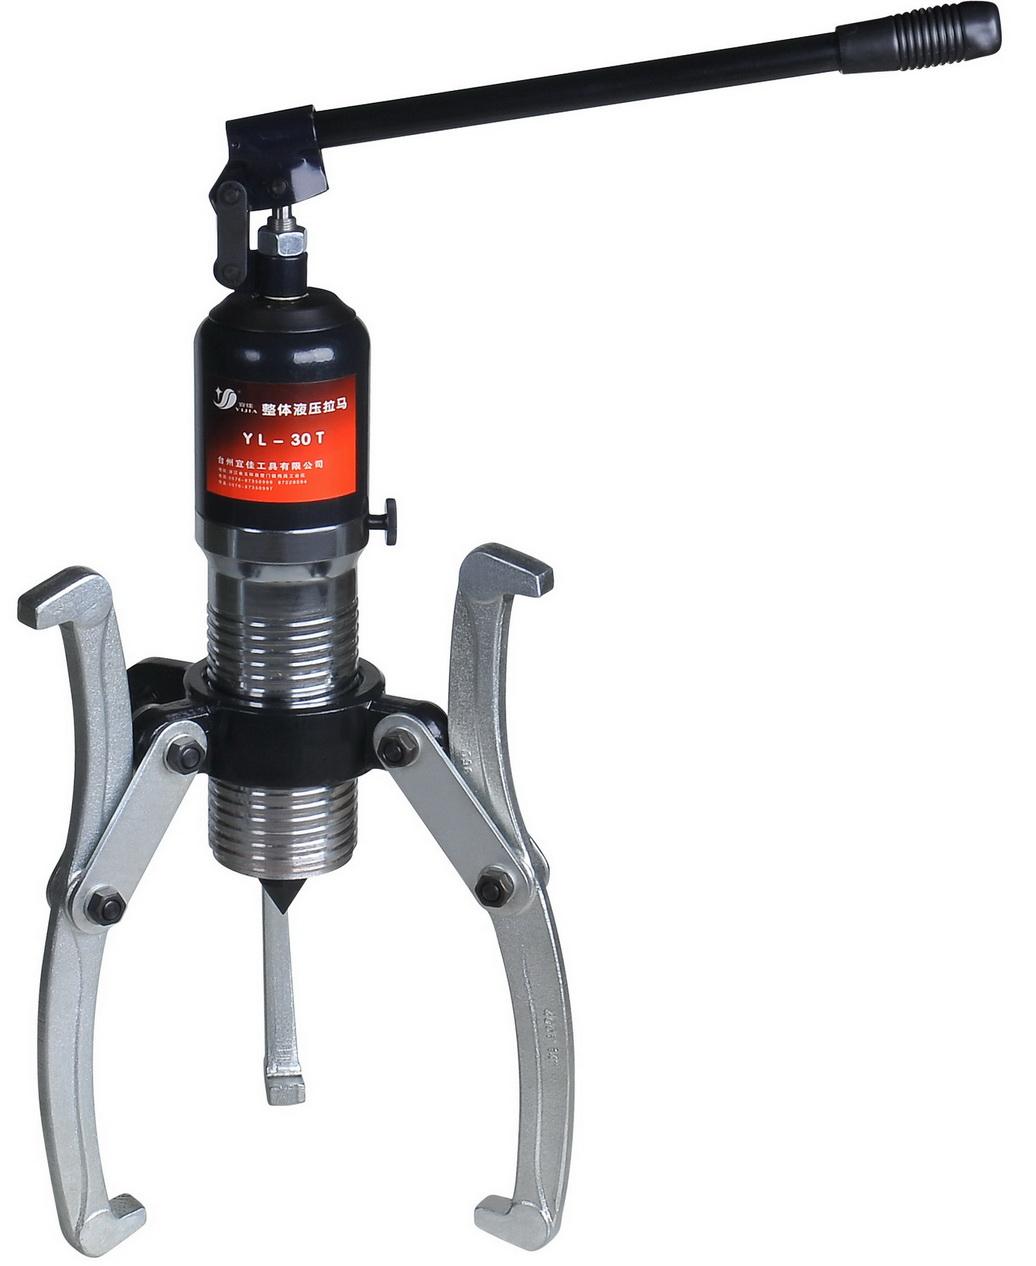 Hydraulic Bearing Puller Mini Project : Hydraulic gear puller bearing pilot